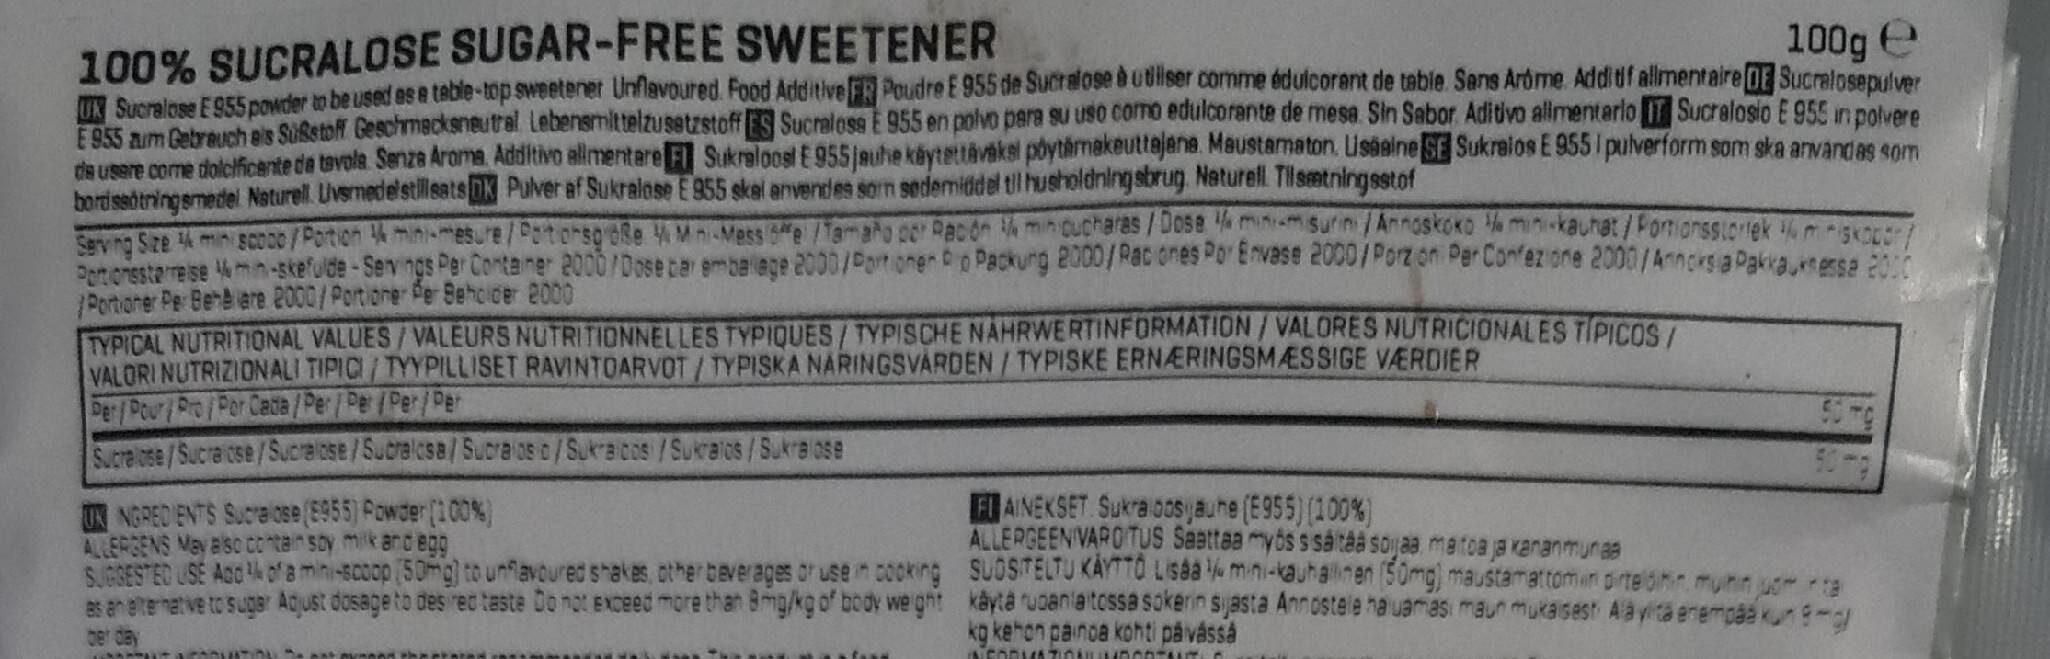 Sucralose - Unflavoured - 100G - Informations nutritionnelles - fr